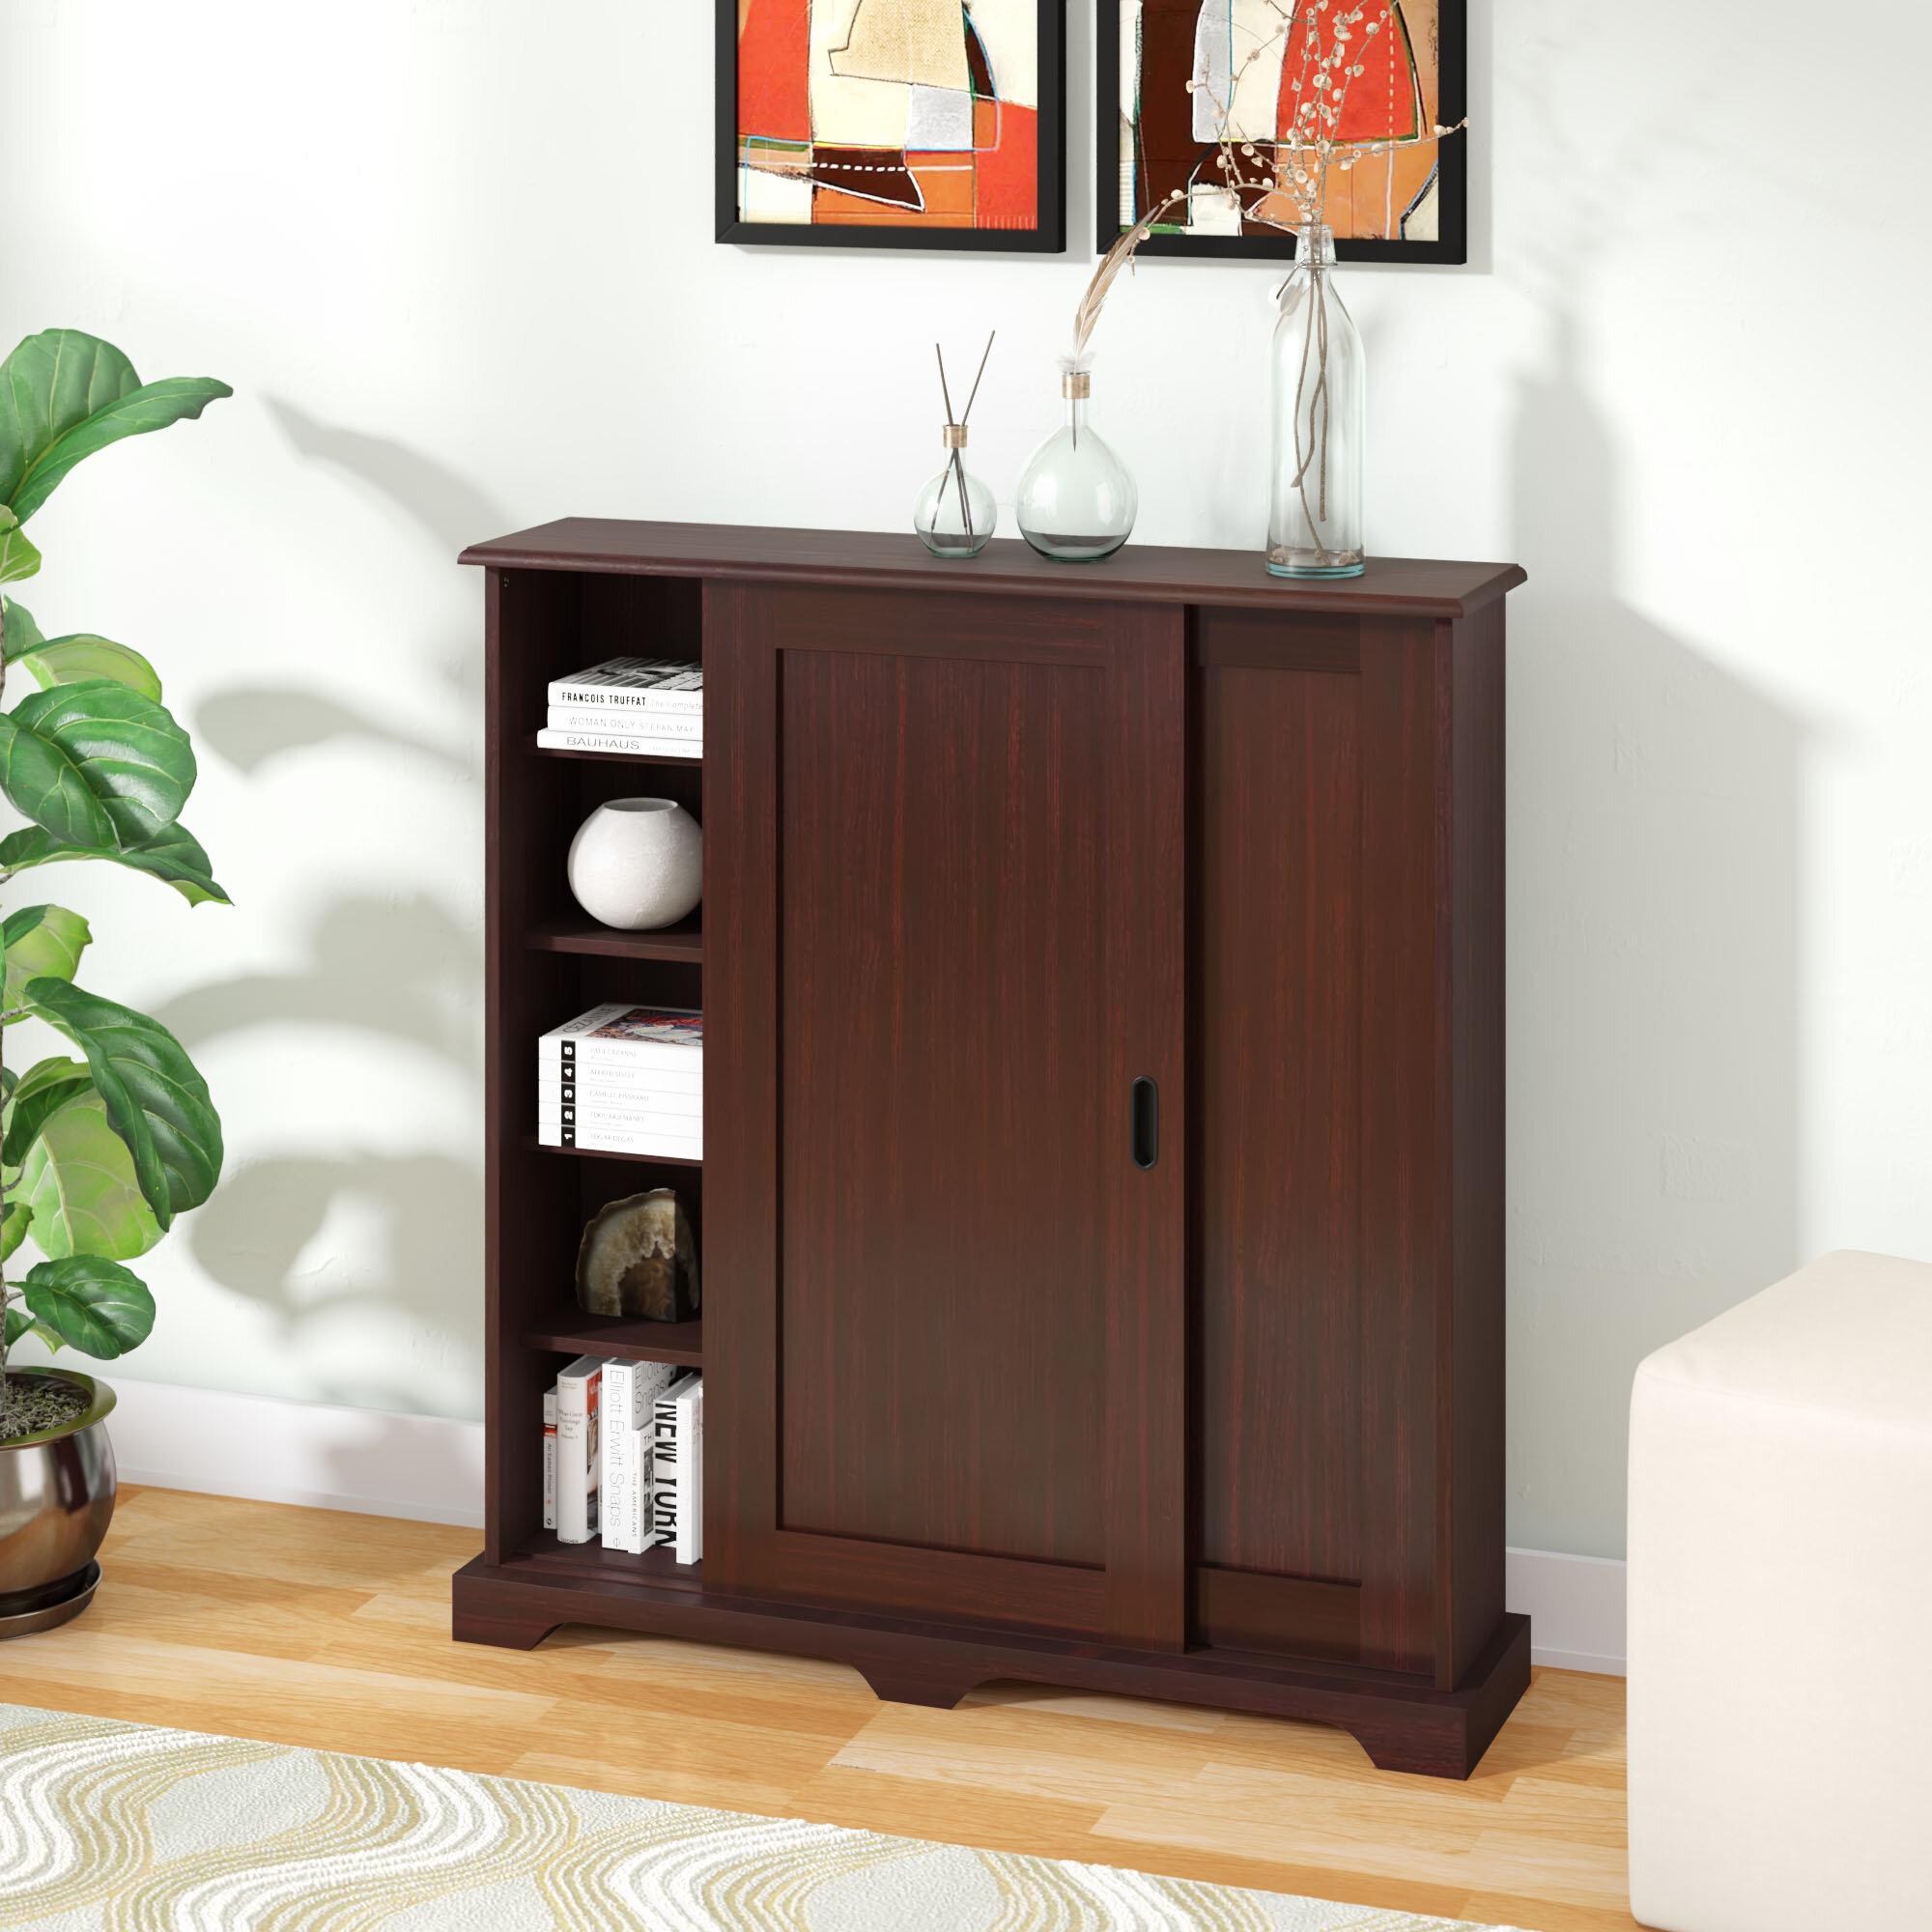 found pin pinterest console granite at wayfair it cabinet media falls tv furniture